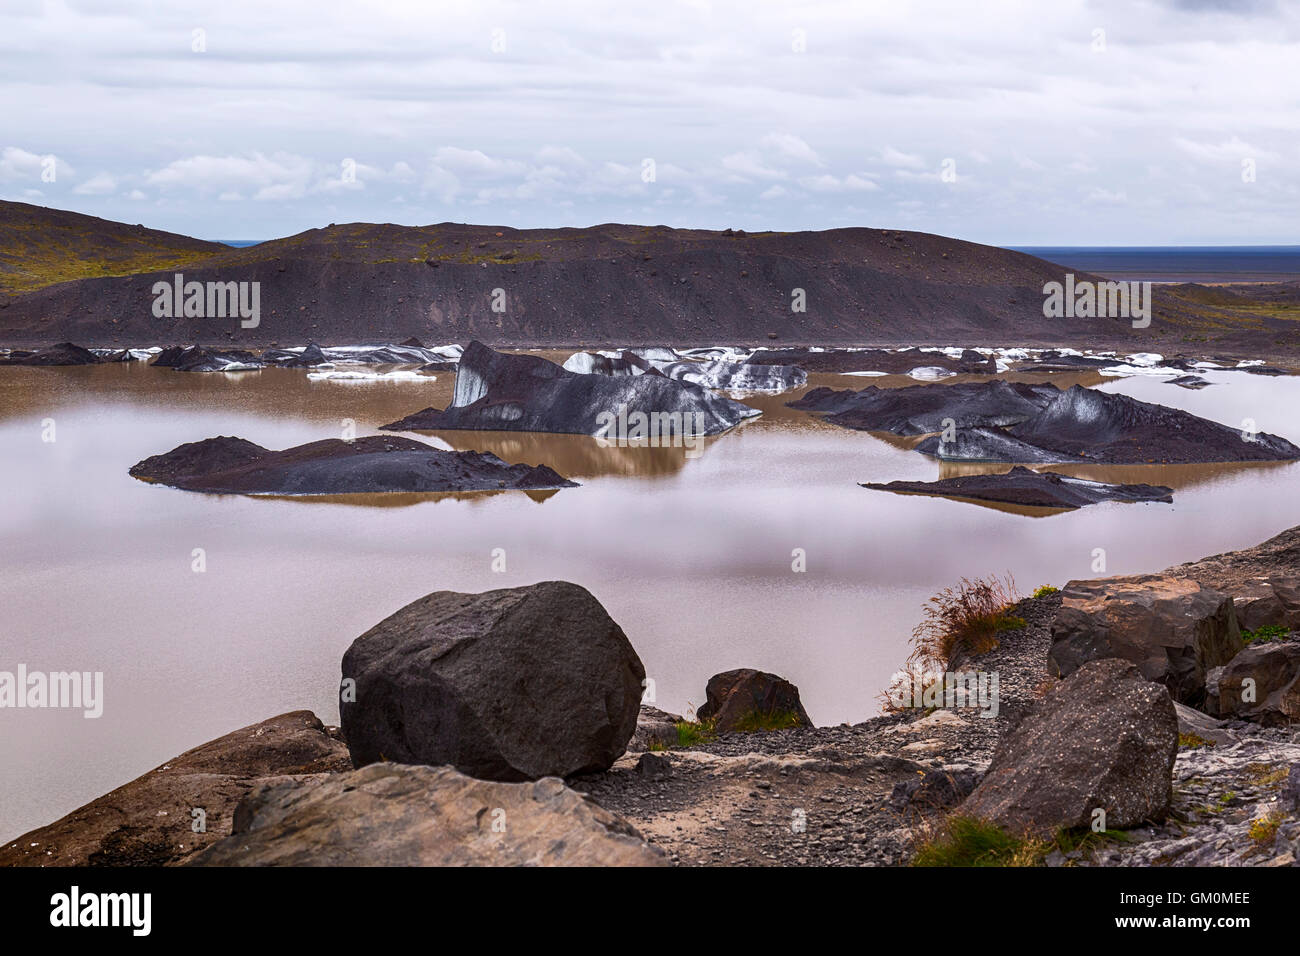 Svinafellsjokull, Vatnajokull, glacier, Iceland - Stock Image